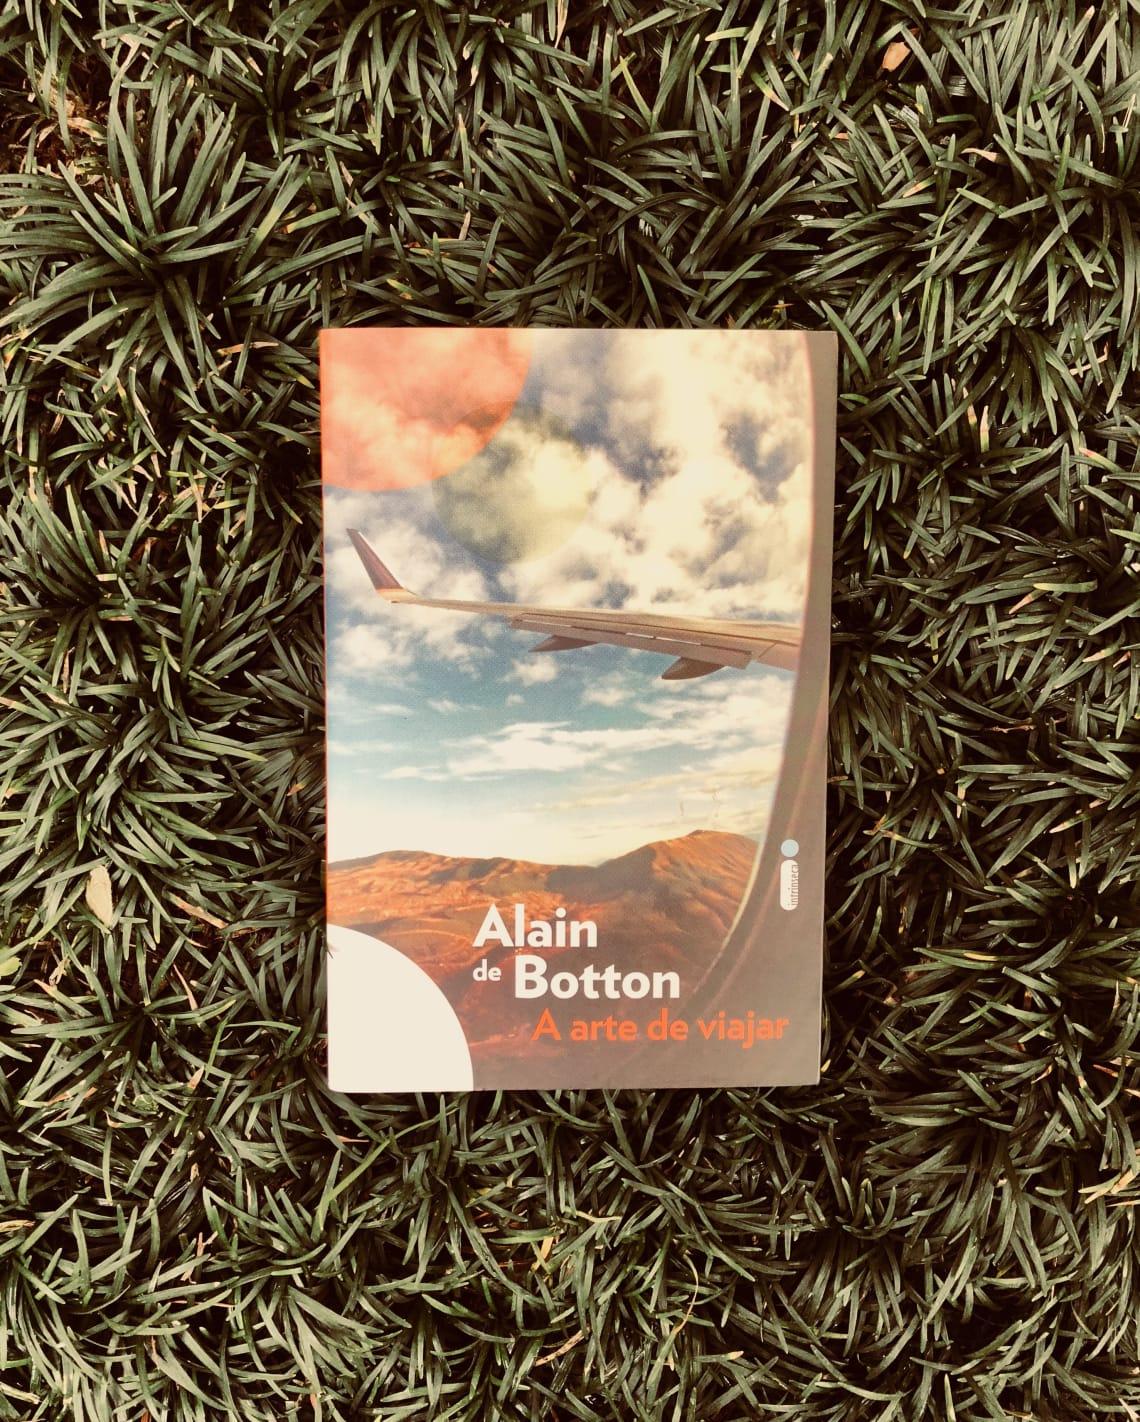 a arte de viajar,Alain de Botton